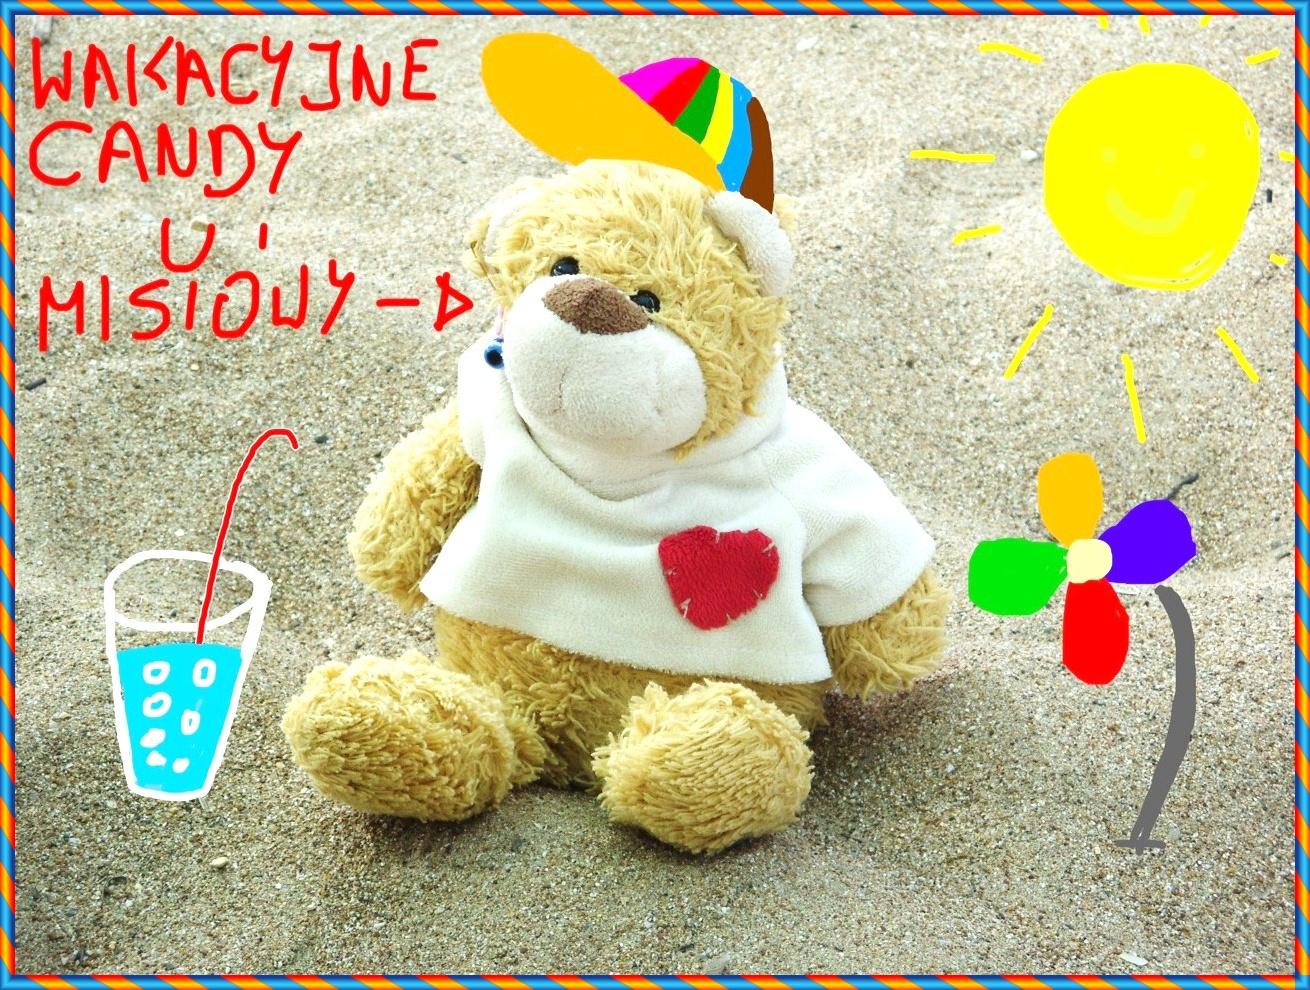 Wakacyjne Candy u Kasi :)